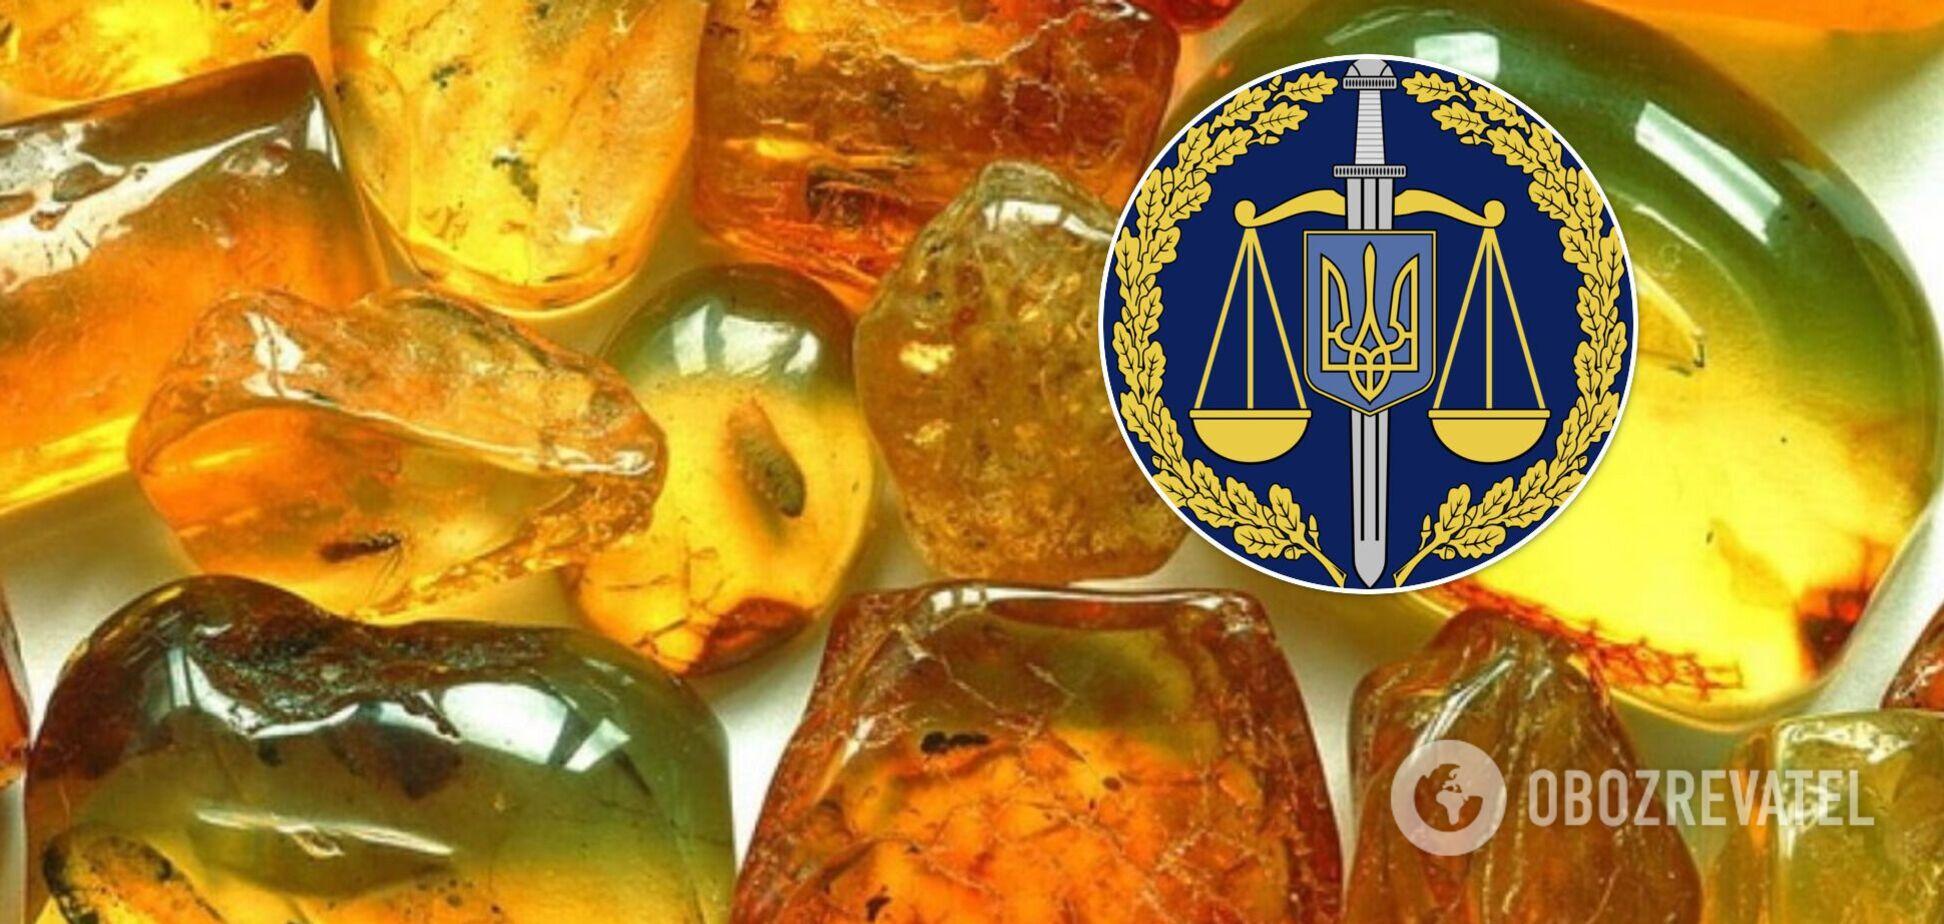 В двух областях Украины изъяли тонну янтаря, который готовили на контрабанду. Фото